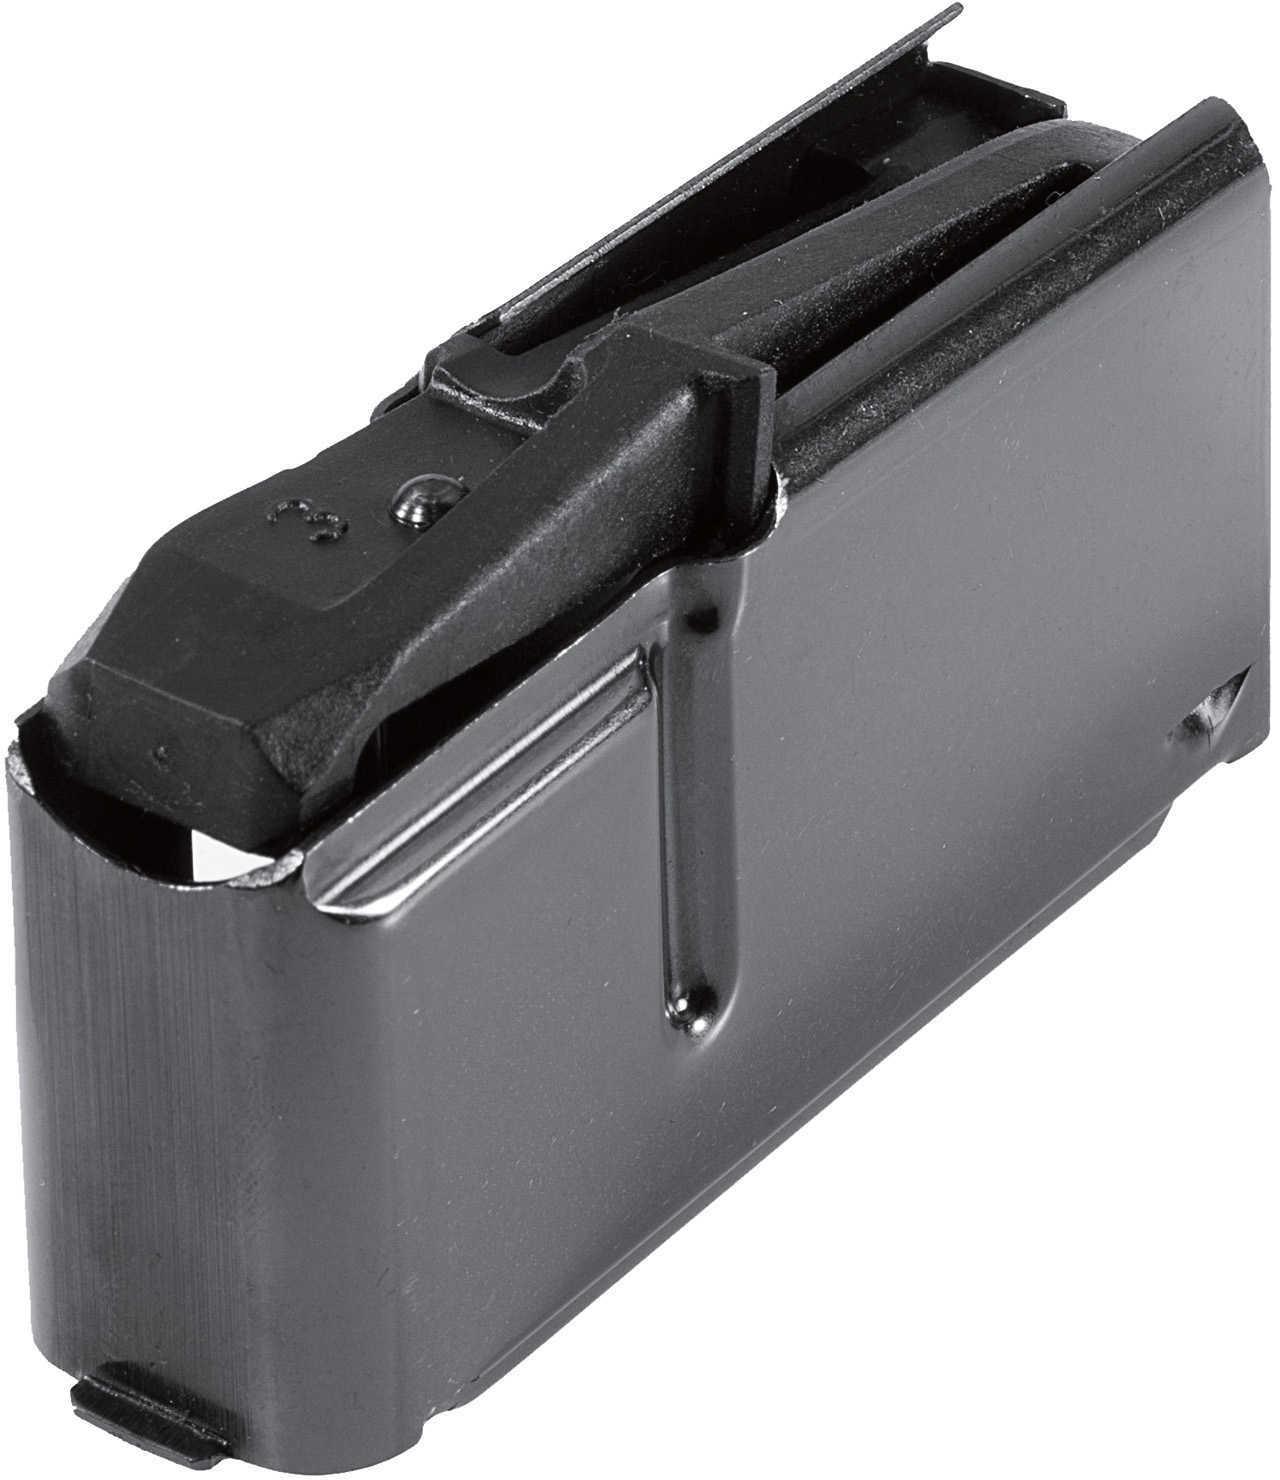 Browning BAR Magazine 300 Winchester Short Magnum Mark II, Capacity 2 Md: 112025030